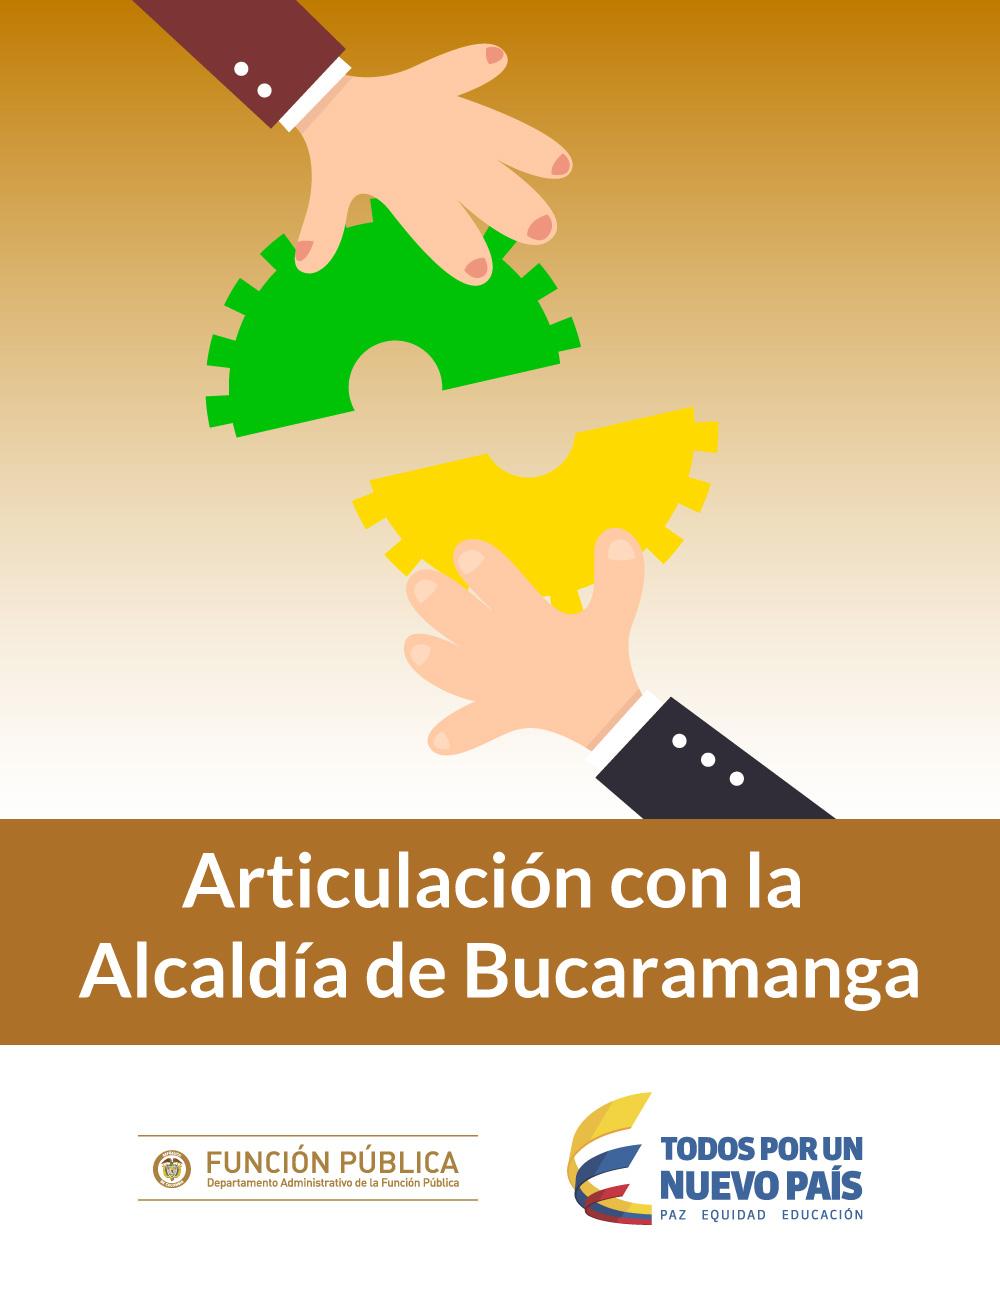 Articulación con la Alcaldía de Bucaramanga